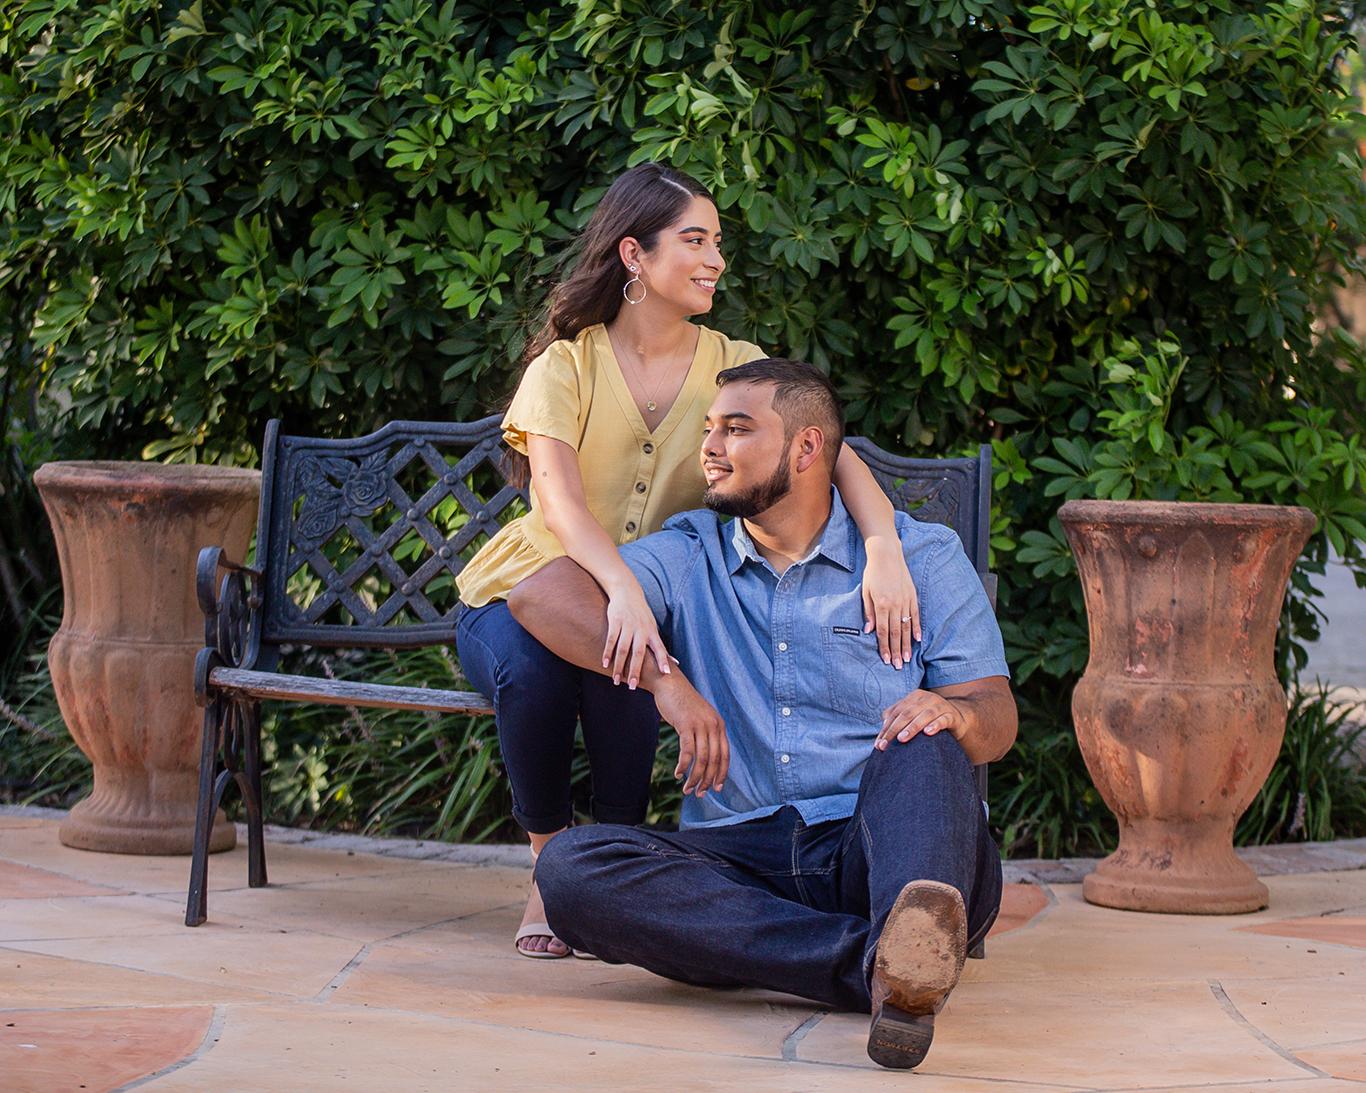 engagement photo shoot couple sitting donna texas